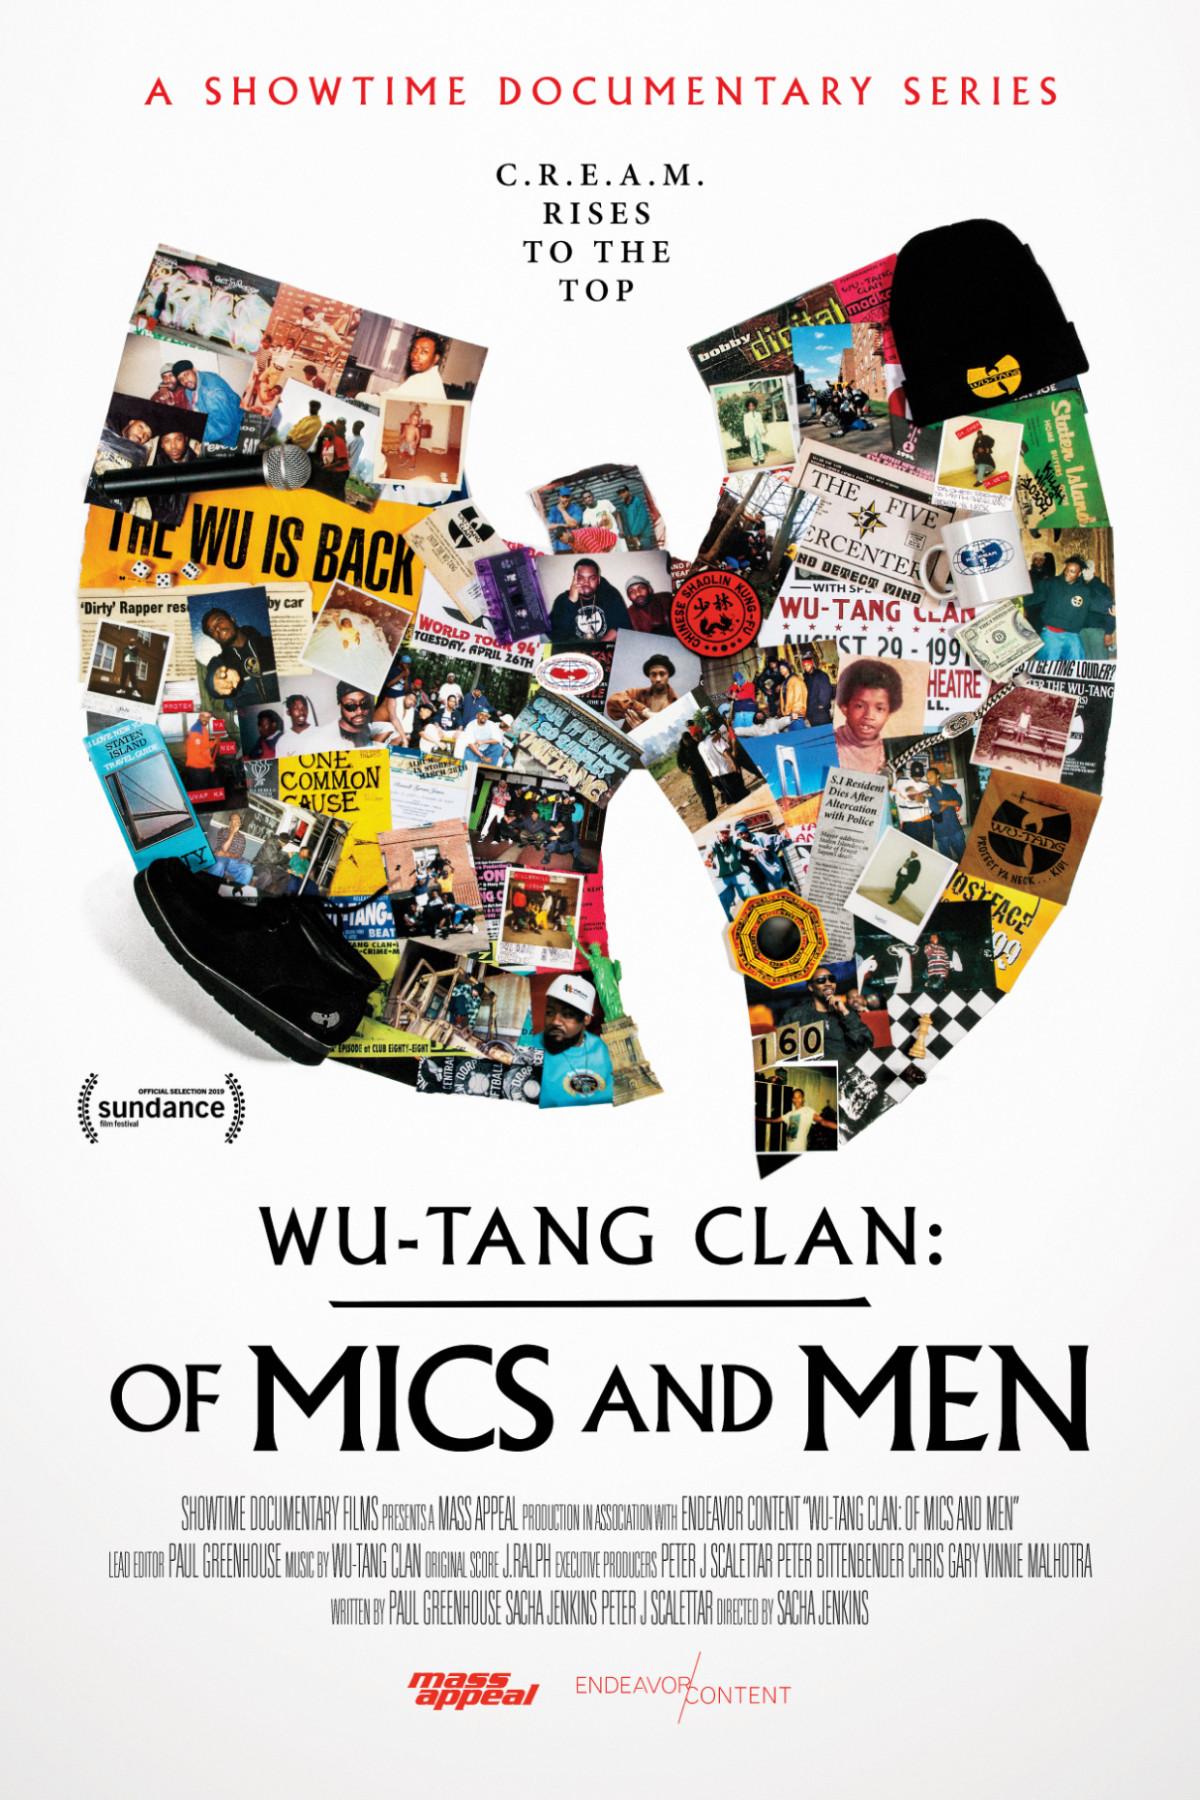 Wu-Tang Clan documentary series of mics and men